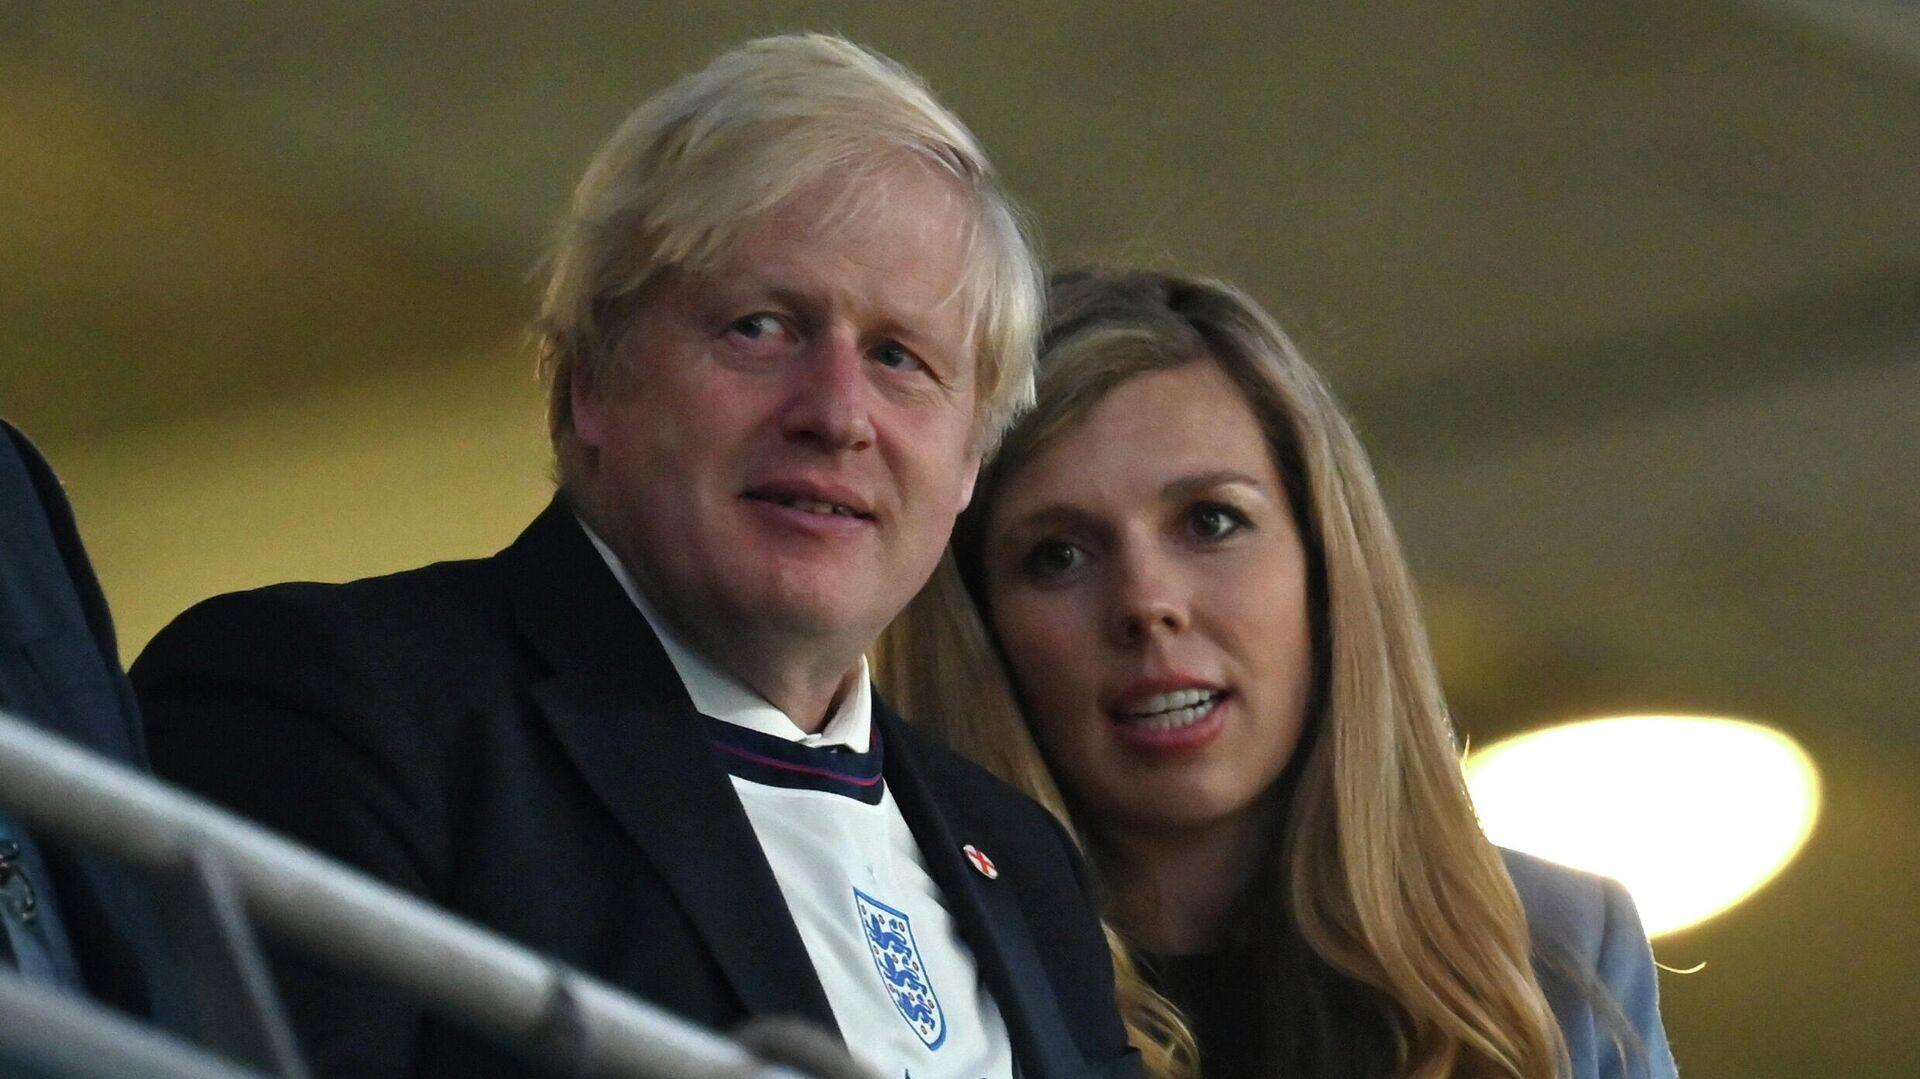 Boris Johnson junto a su esposa, Carrie - Sputnik Mundo, 1920, 02.08.2021